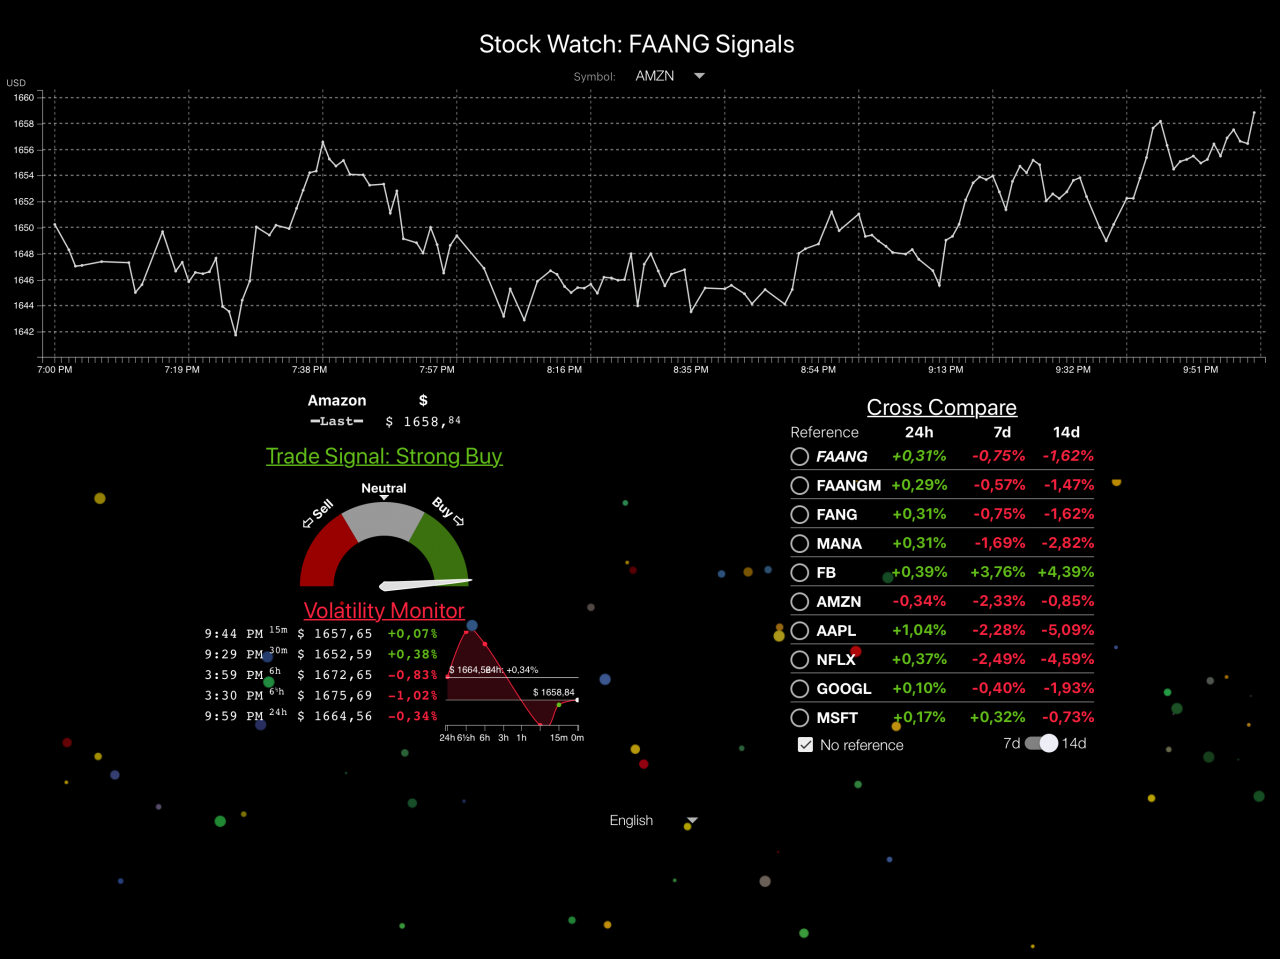 Stock Watch: FAANG Signals